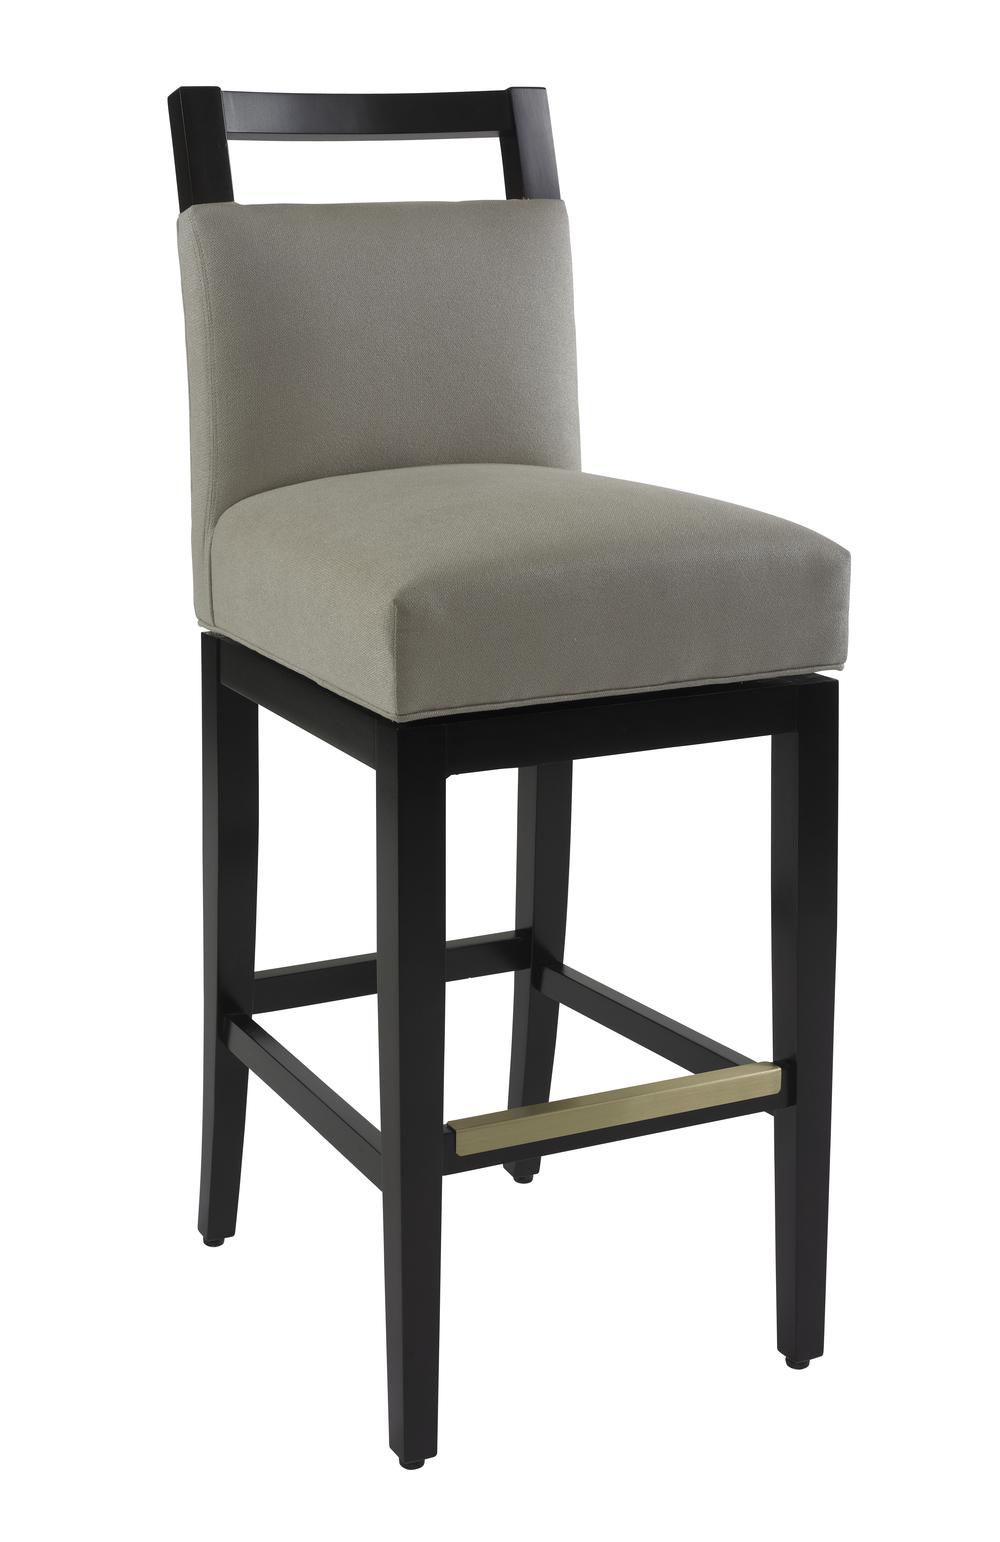 Designmaster Furniture - Claremont Bar Stool